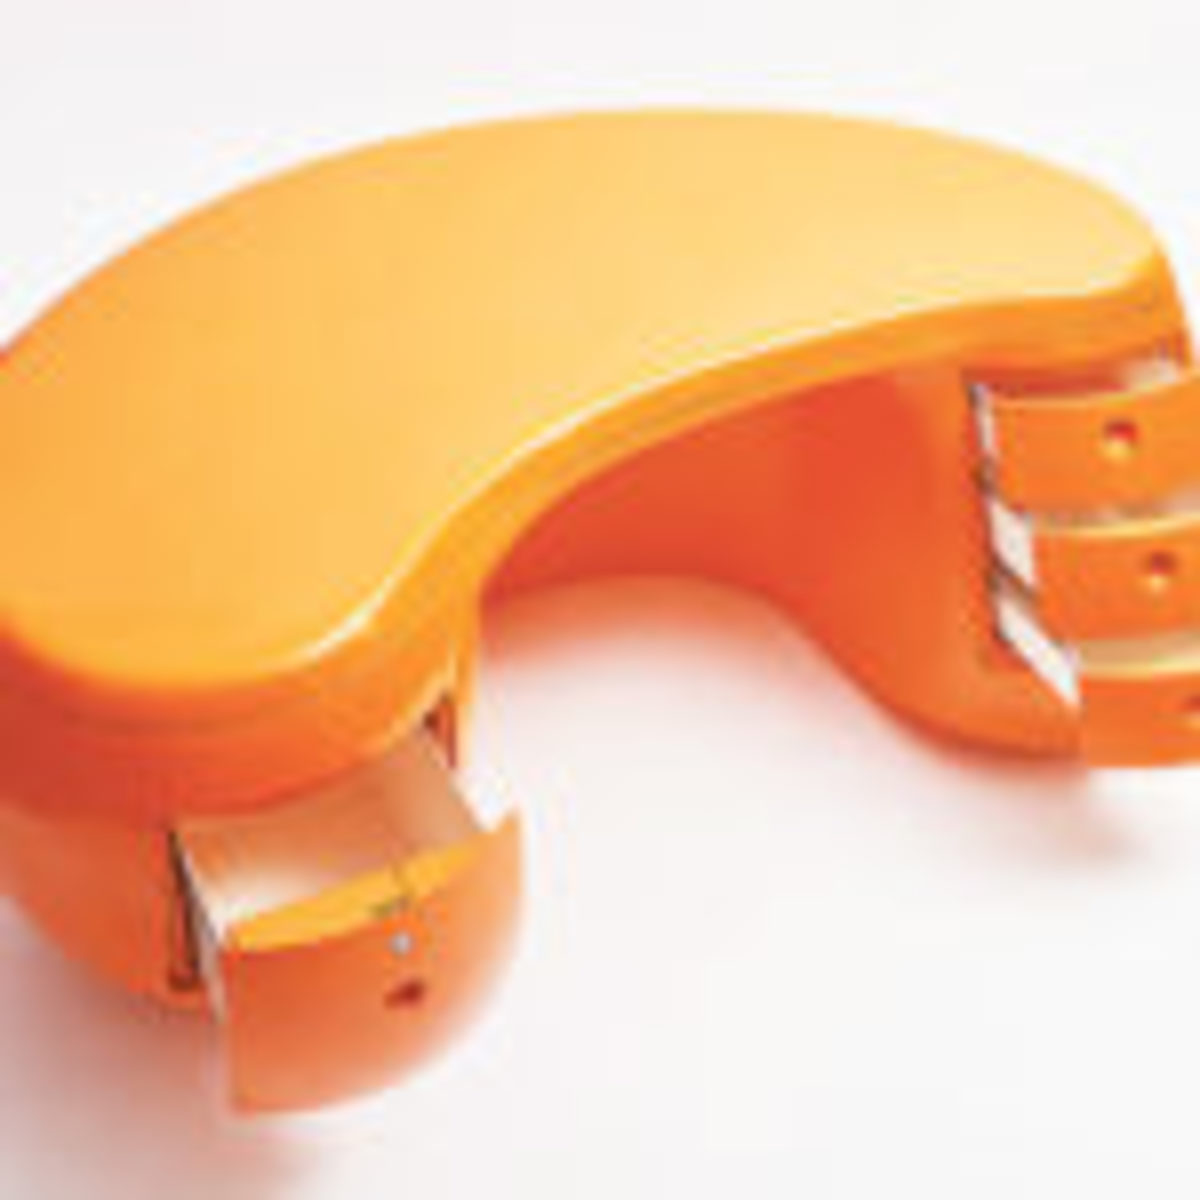 "Maurice Calka, orange Boomerang Desk, France, circa 1970, made by Maison Leleu, fiberglass, 33 1/2"" d. x 30 1/2"" h. x 70 1/2"" w., $85,000. Image courtesy of eBay Collective"